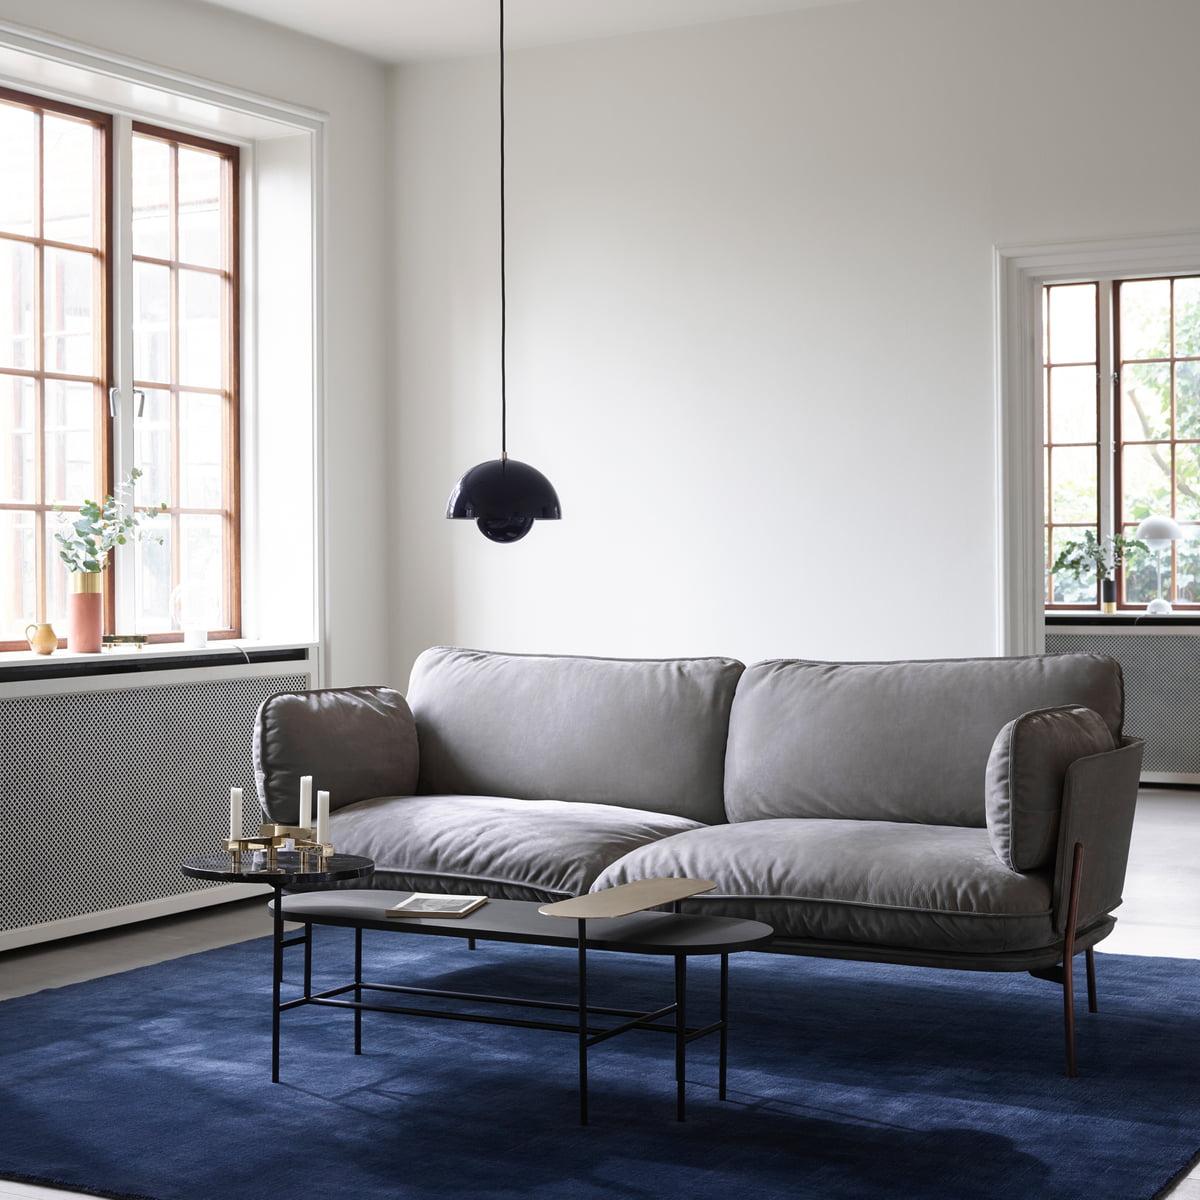 Cloud Sofa Ln 3 2 Von Amp Tradition Connox